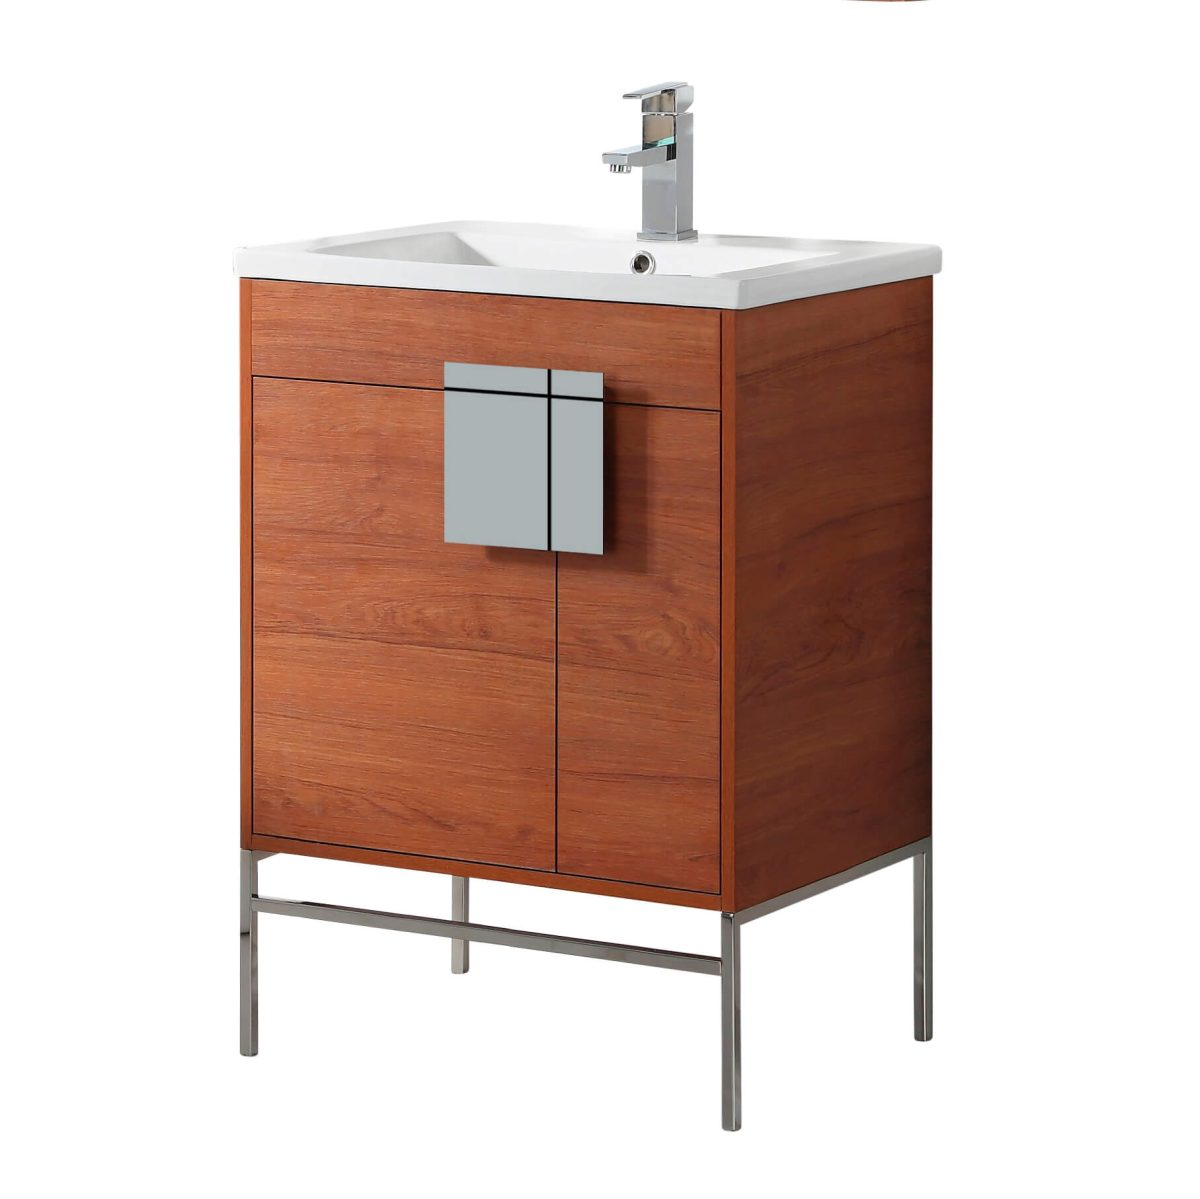 "Shawbridge 24"" Modern Bathroom Vanity  Spicy Walnut with Chrome Hardware"